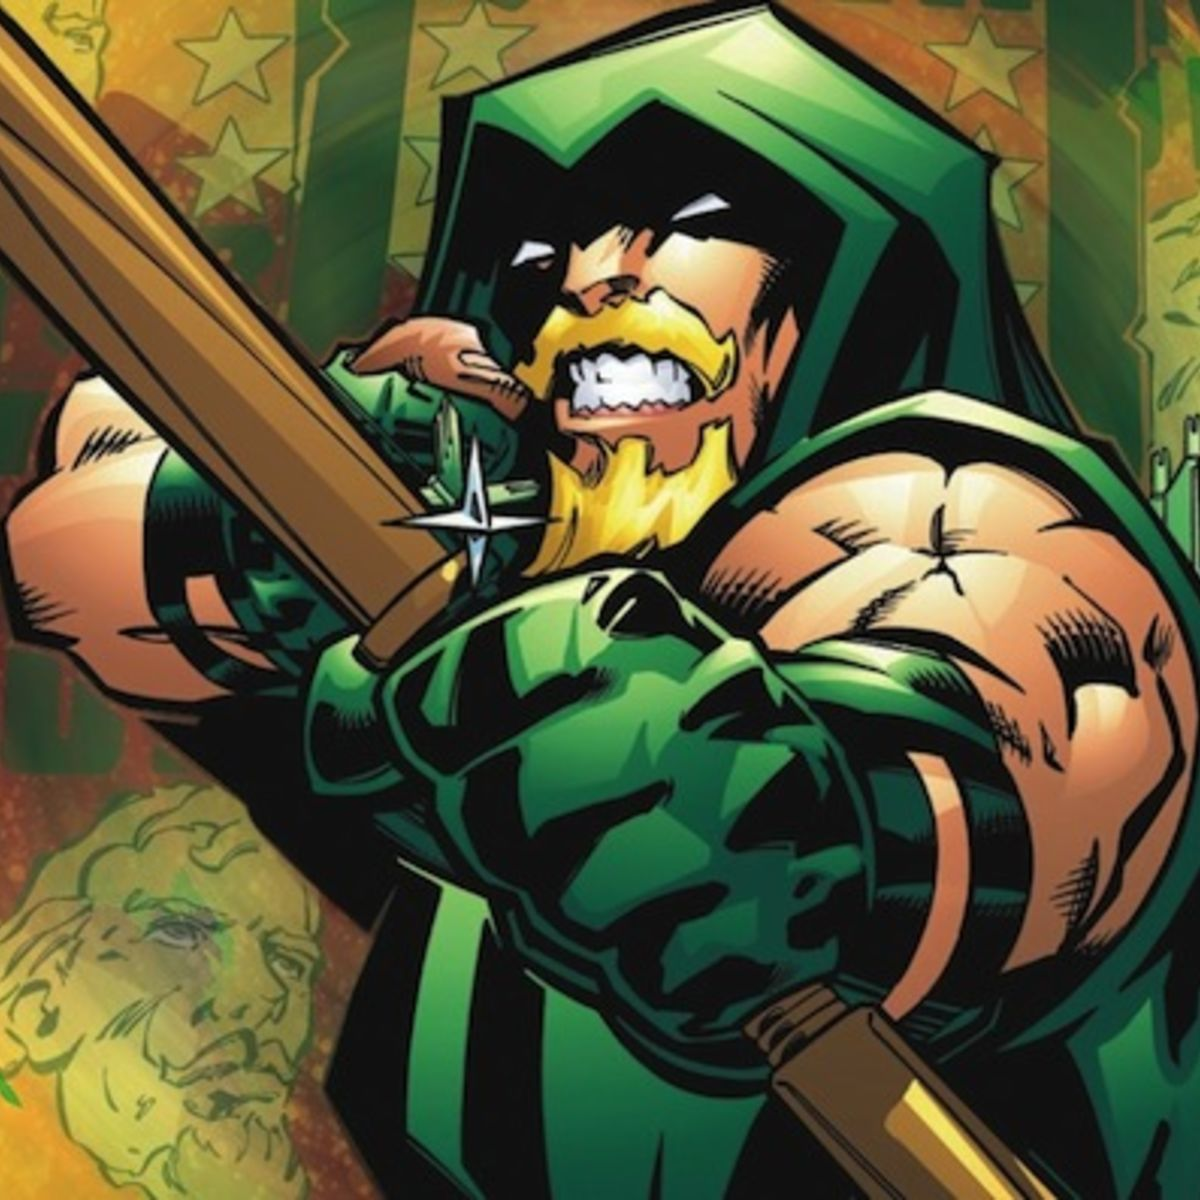 Green-Arrow-dc-comics.jpg